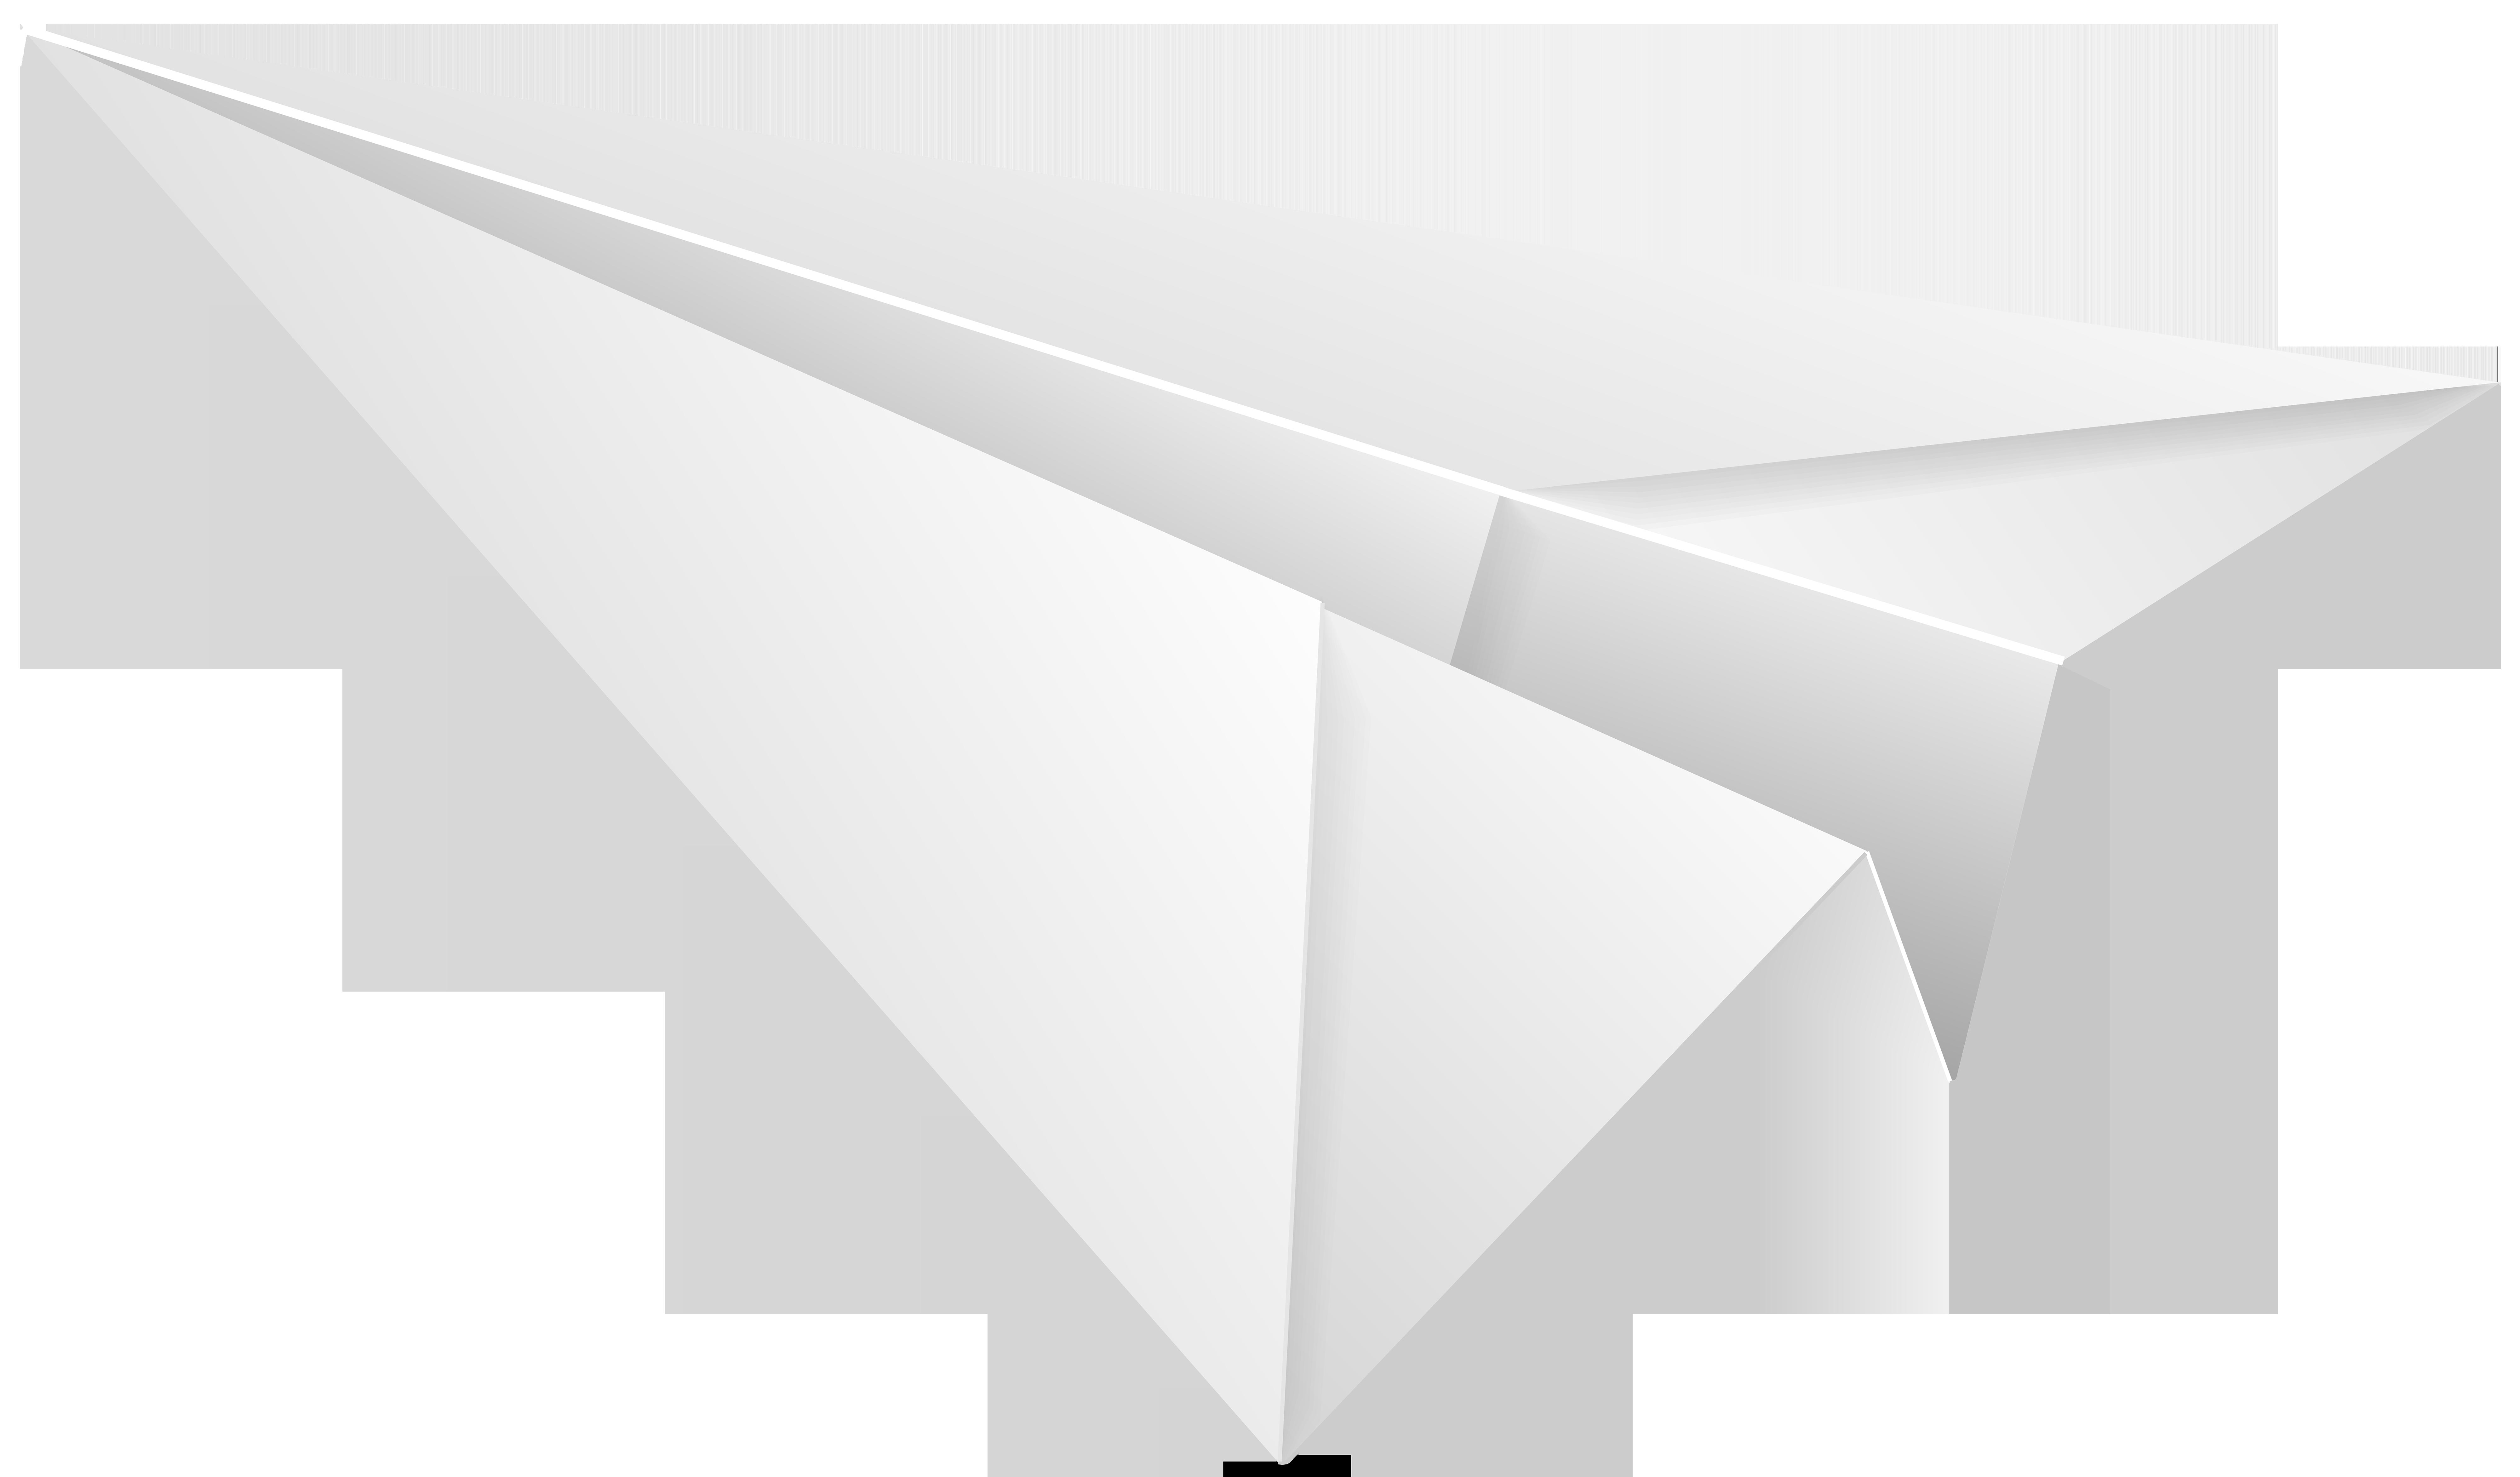 Paper png clip art. Clipart plane summer